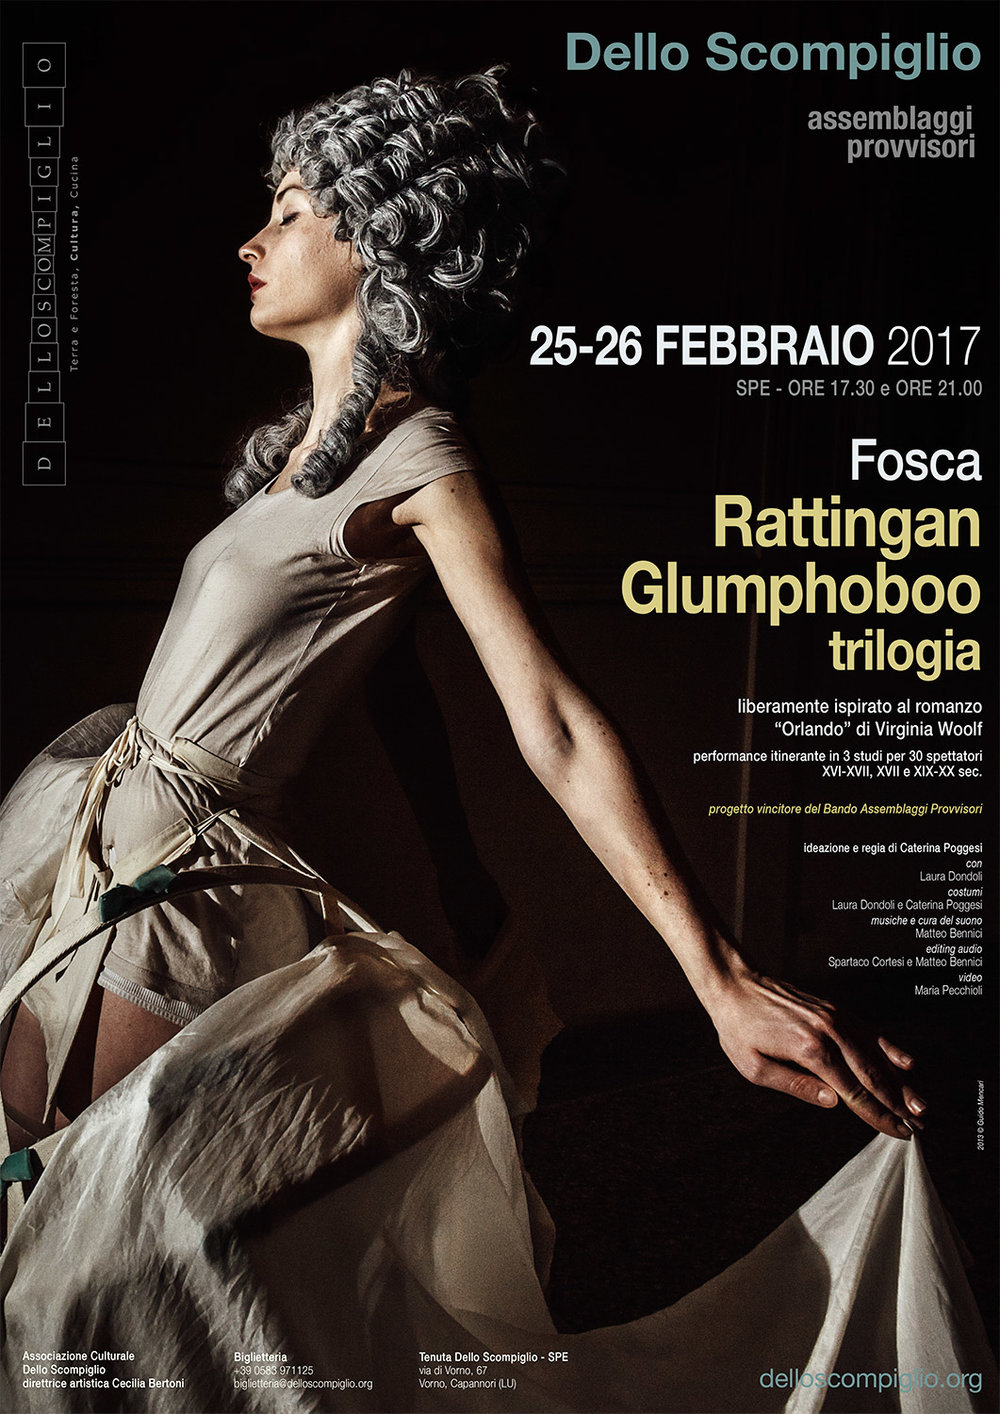 Fosca/Caterina Poggesi | Rattingan Glumphoboo